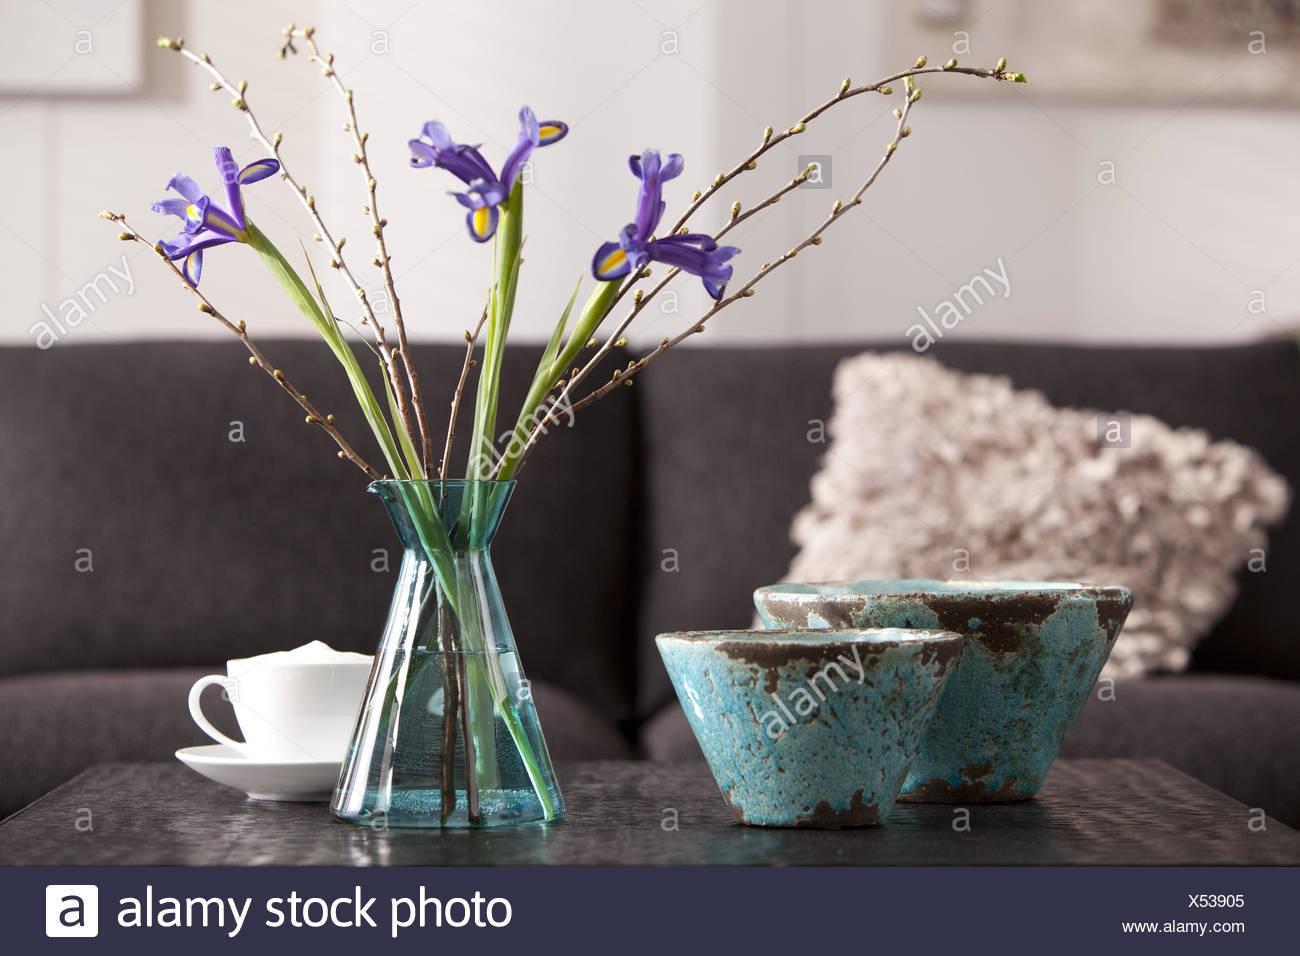 Interieur, Vase, Blumen, Becher, Schalen, Kissen, Stockbild